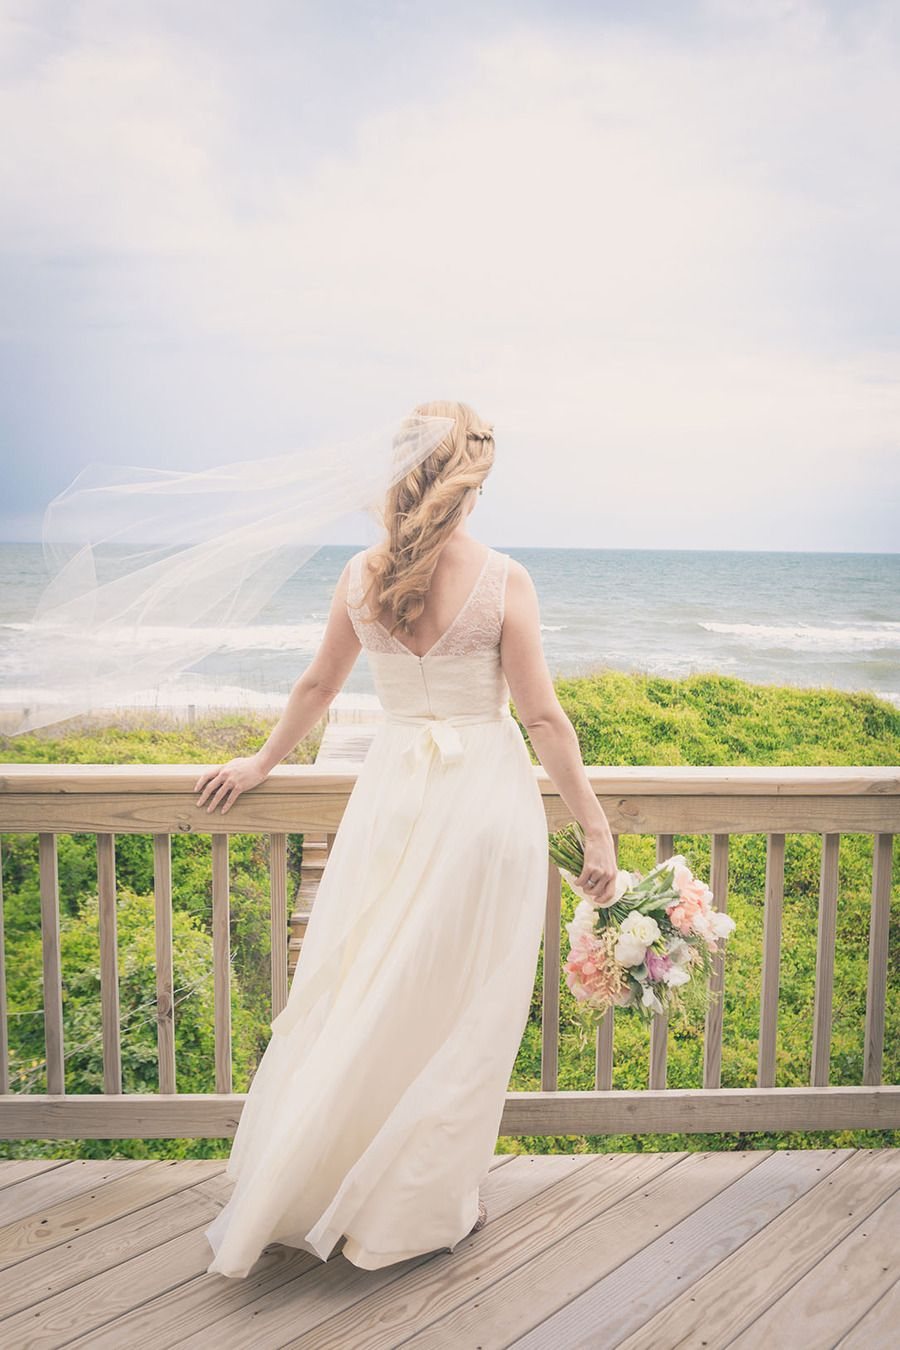 Dye wedding dress after wedding  North Carolina Wedding from Beach Productions  Beach Weddings and